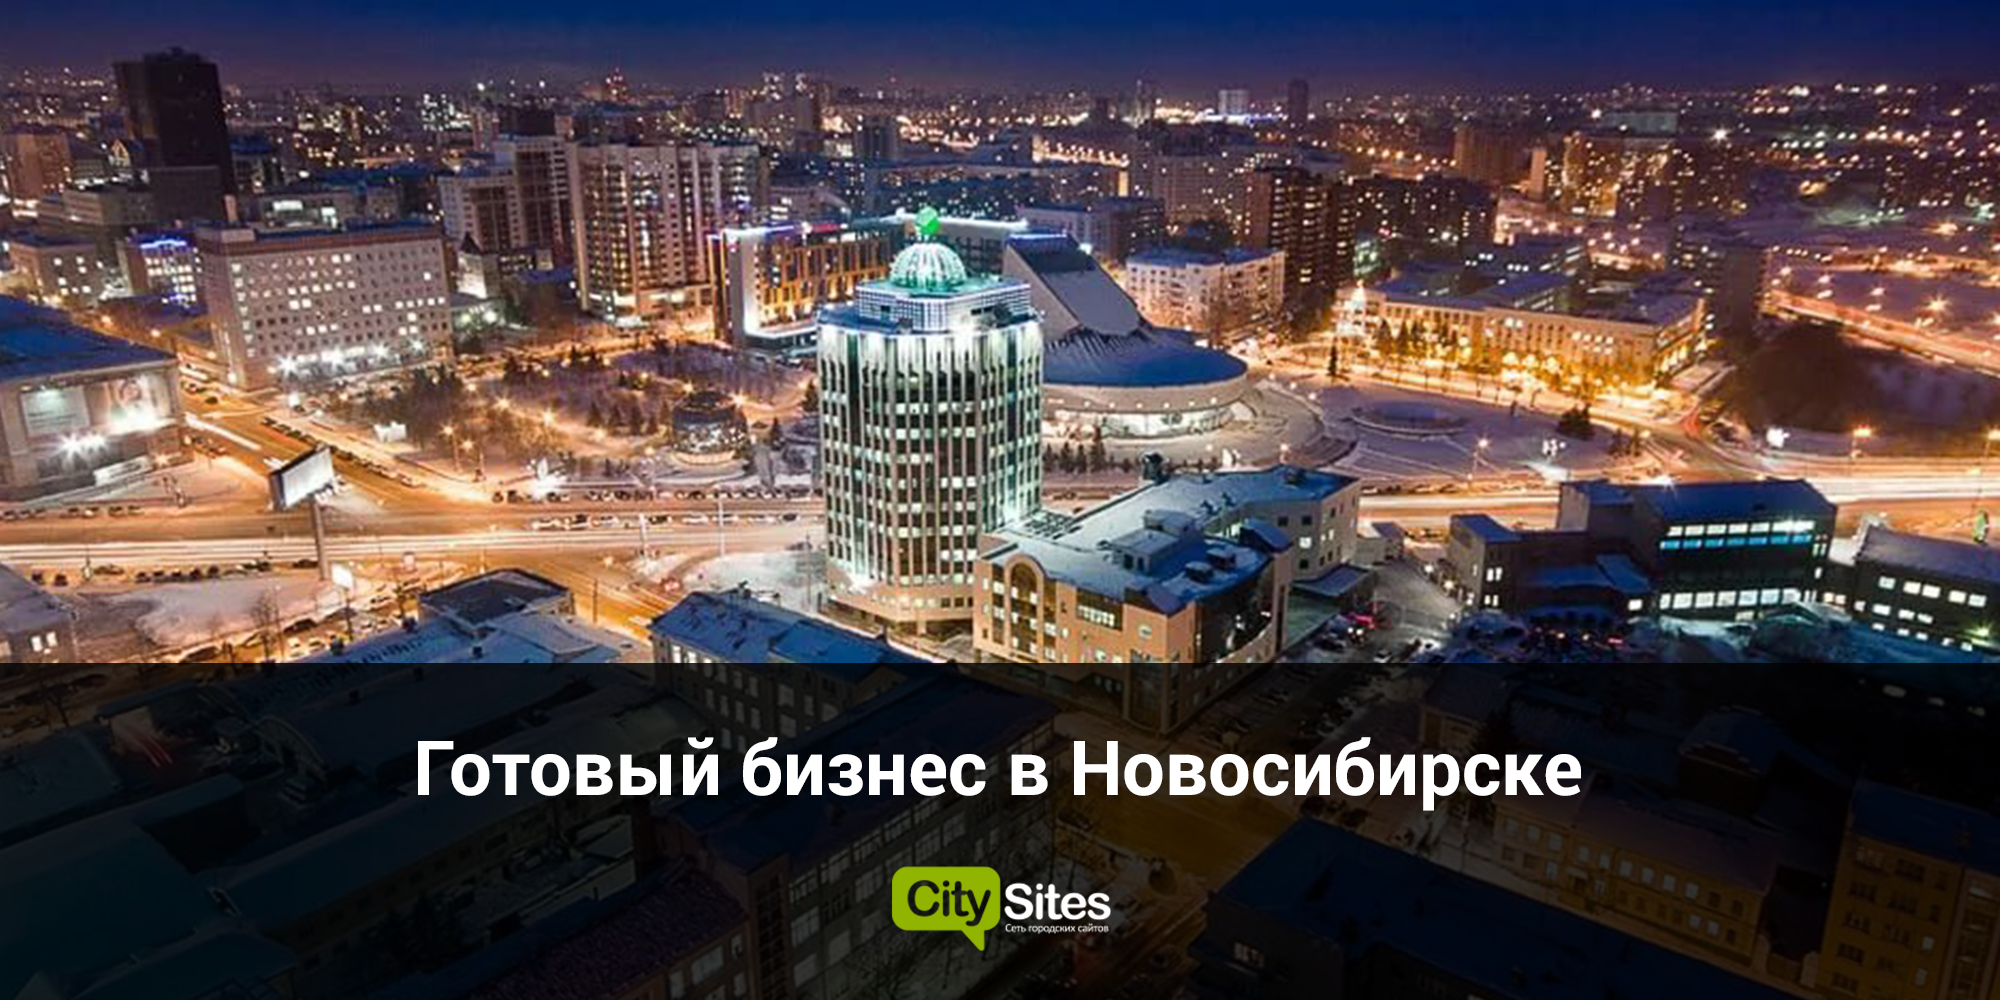 бизнес в новосибирске